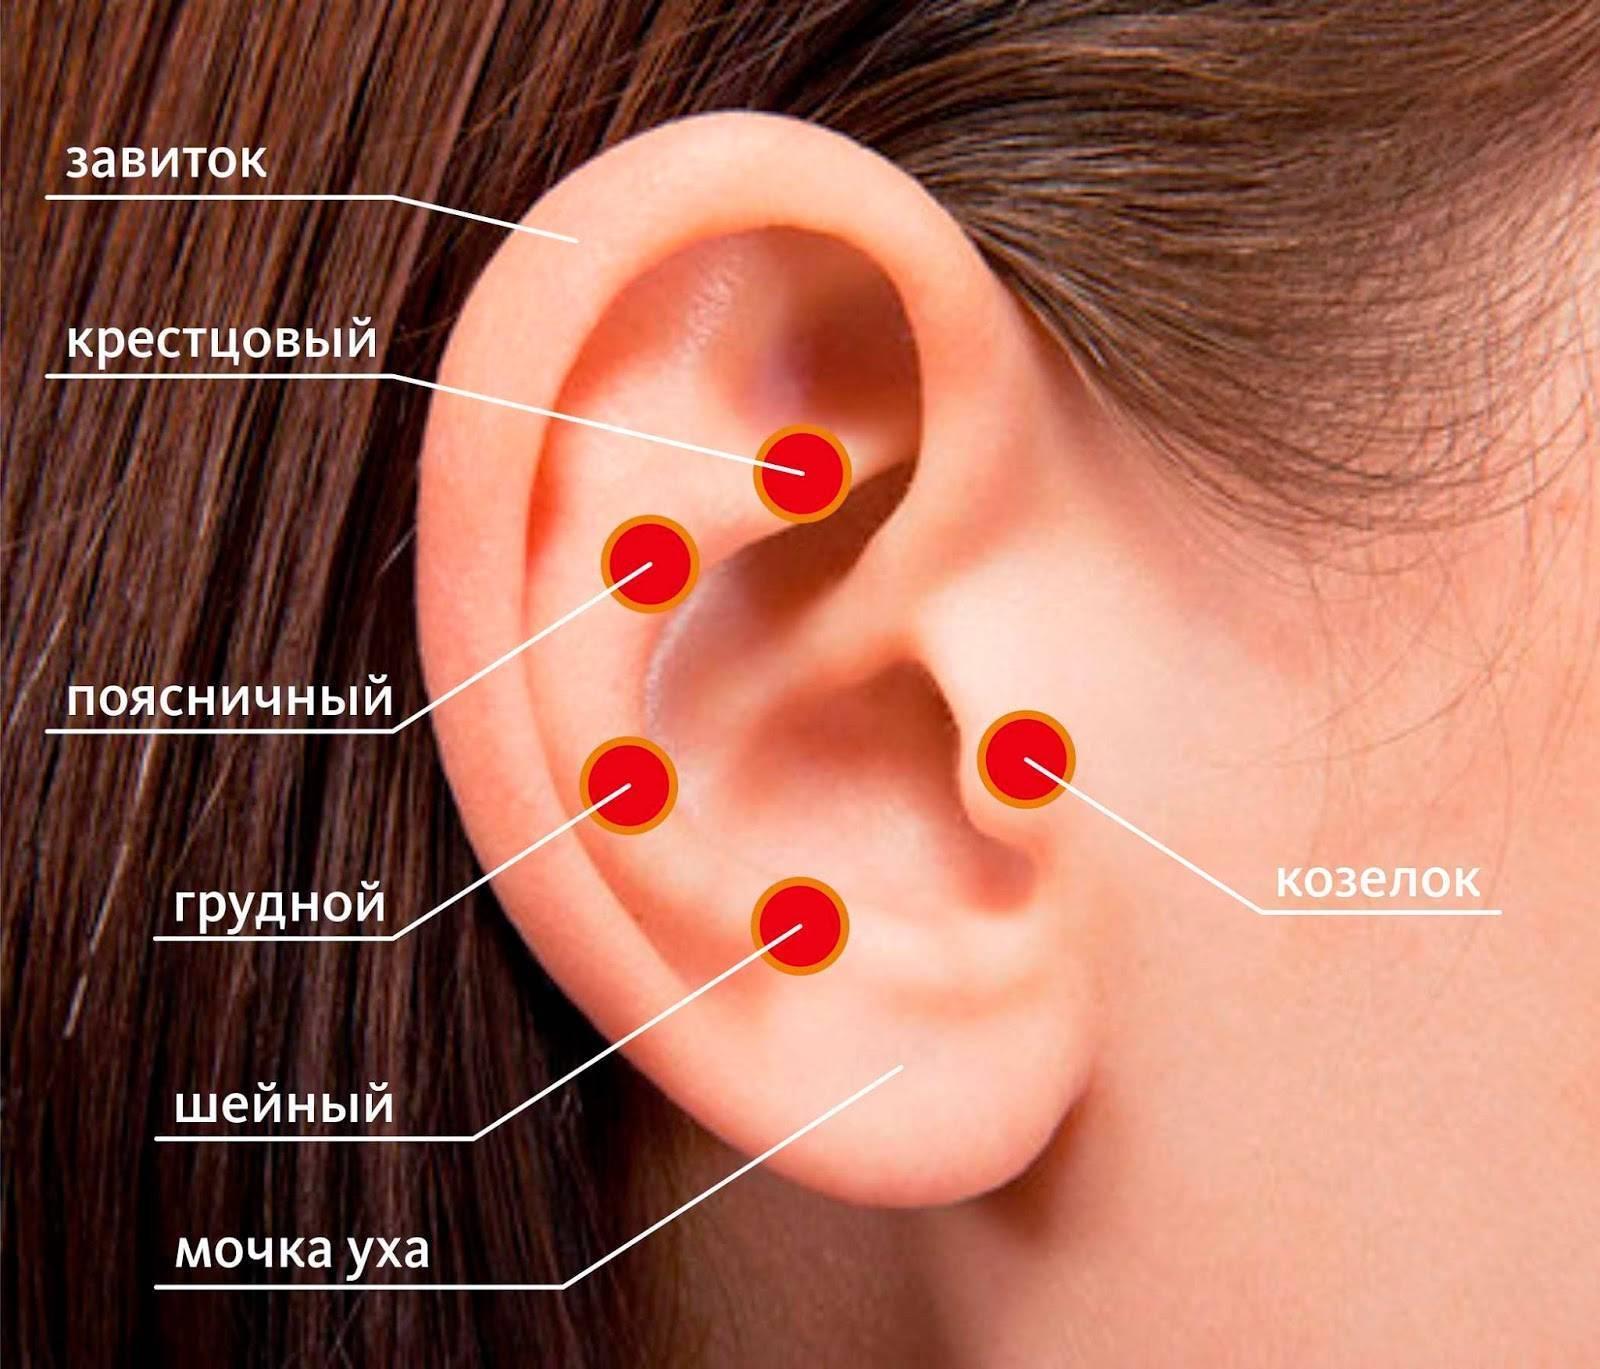 какие точки на ухе лечат глаза